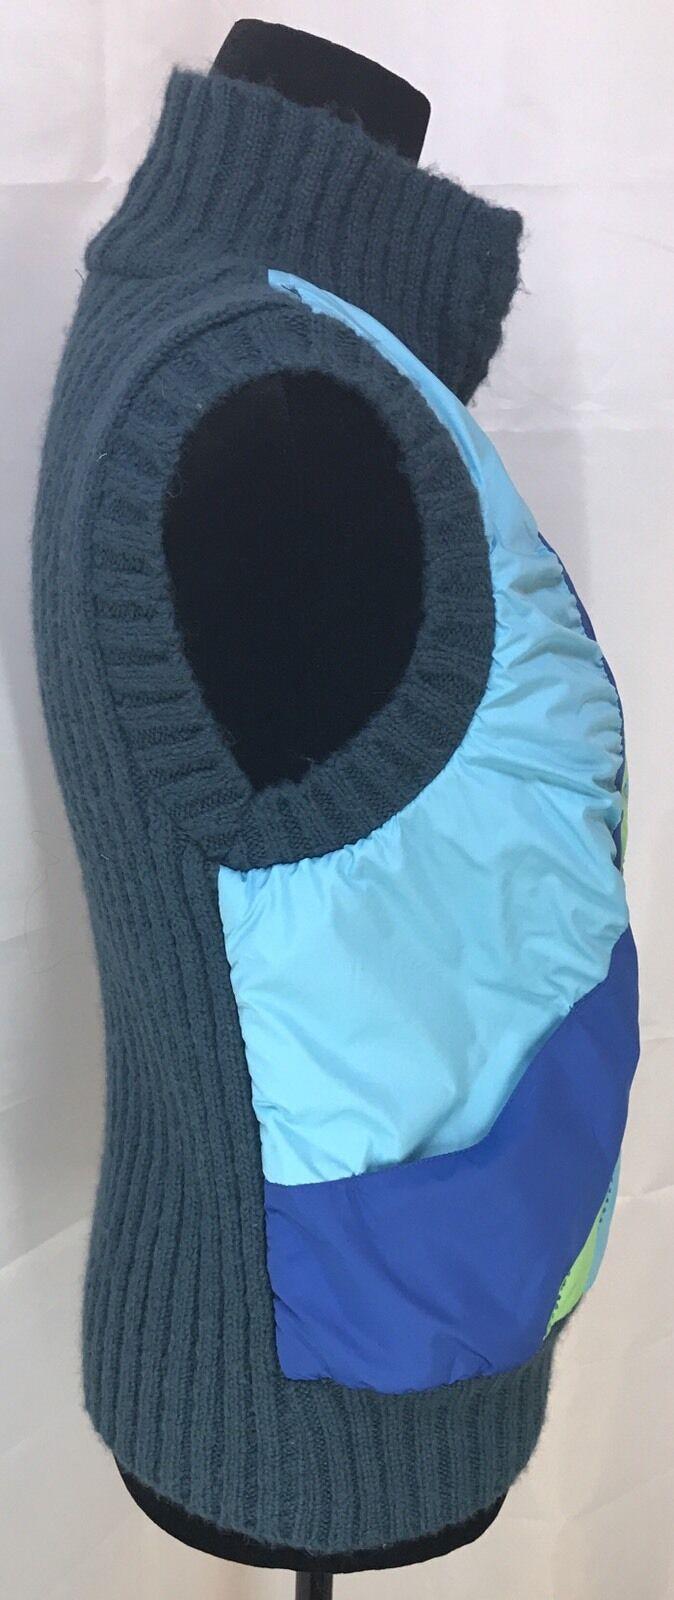 Free People Zipper Zipper Zipper Puffer With Down Multi color Vest In Size M bluee & Green 282114